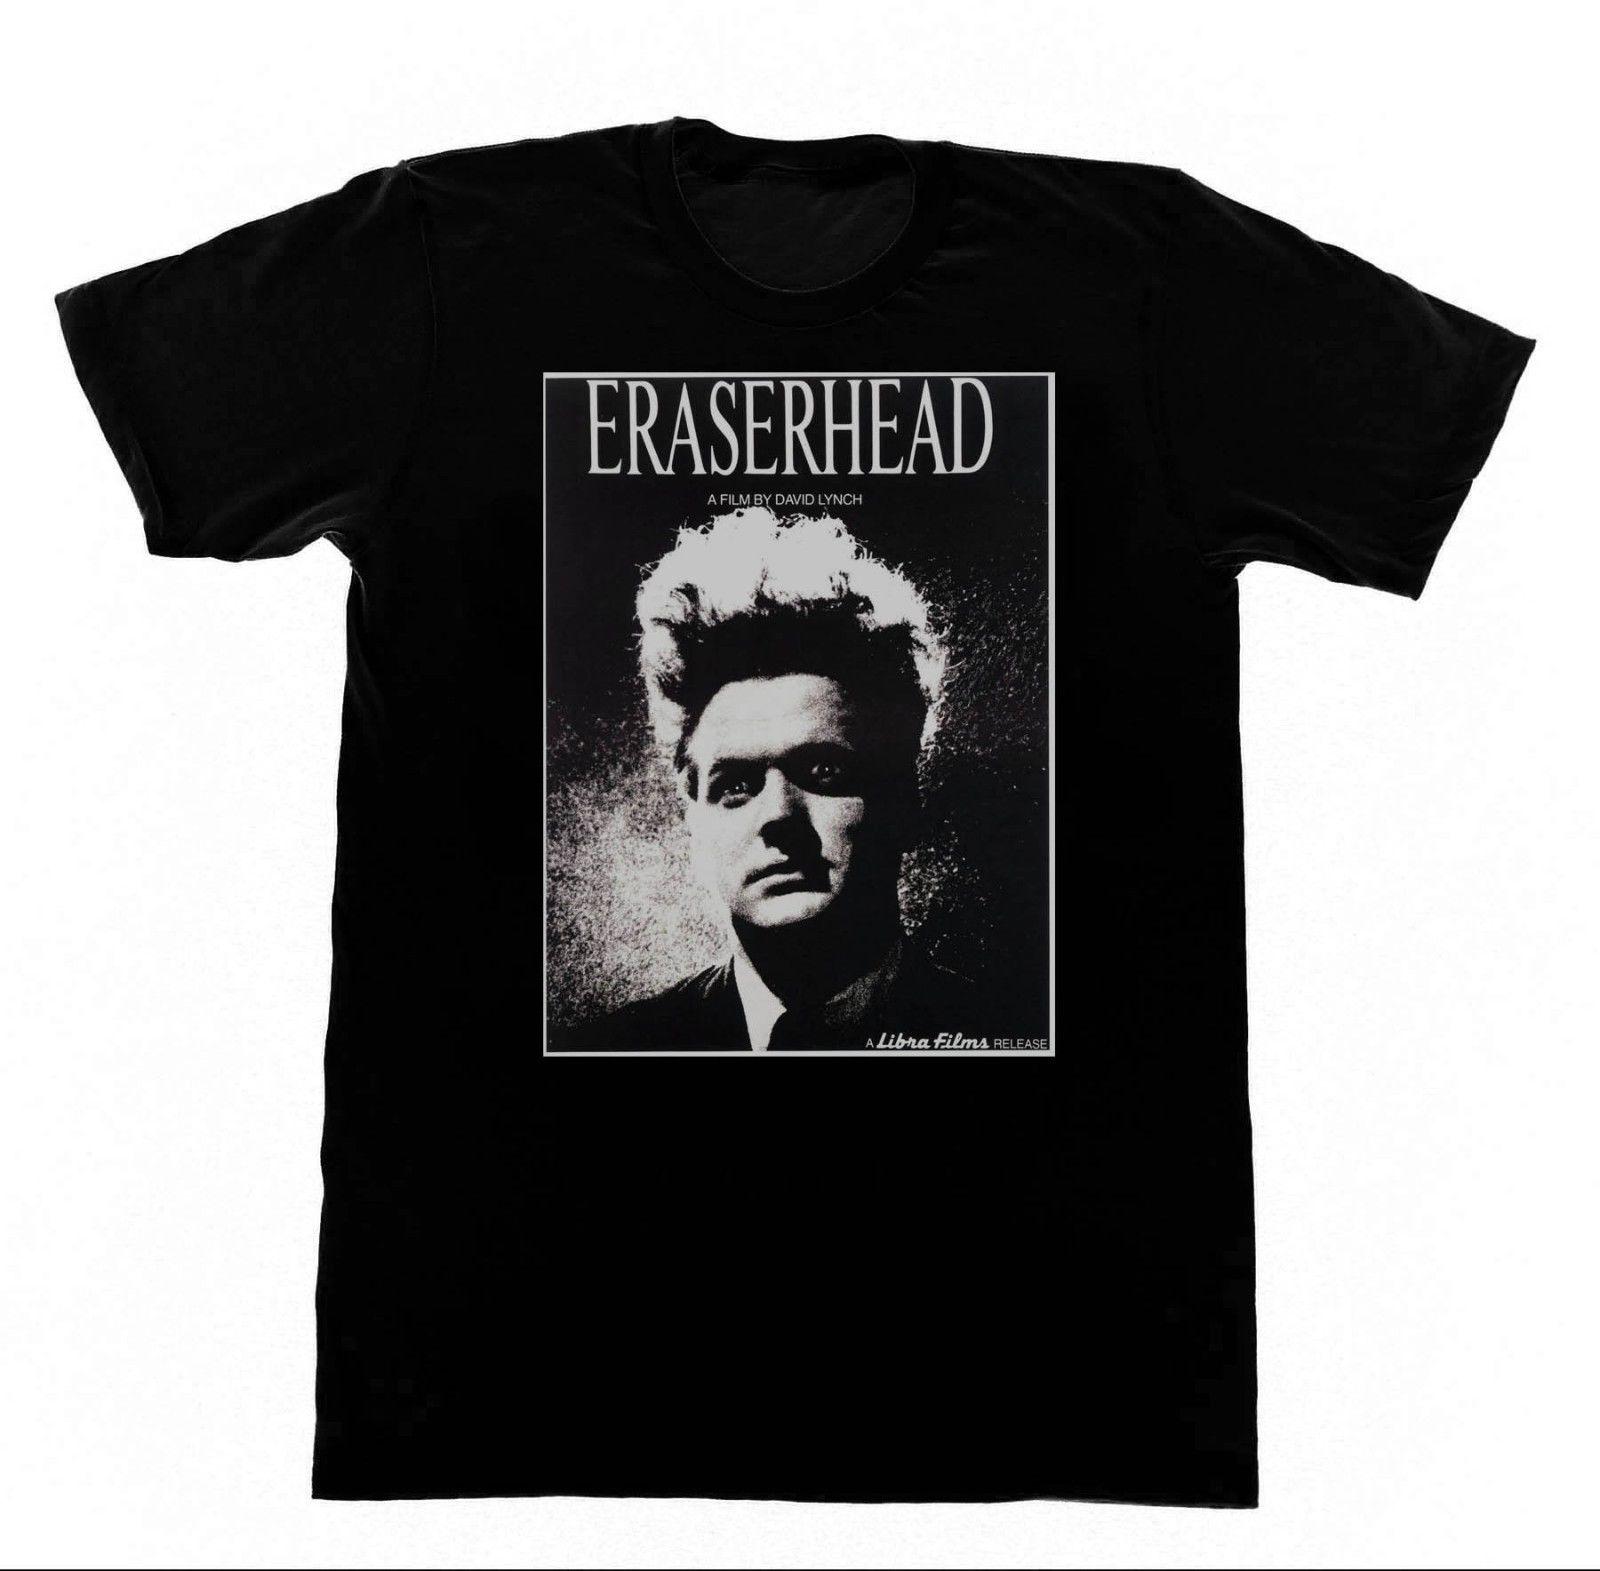 Eraserhead T-shirt David Lynch Eraser Head Twin Peaks 100% Cotton T Shirt for Man Top Tee O-Neck Stylish